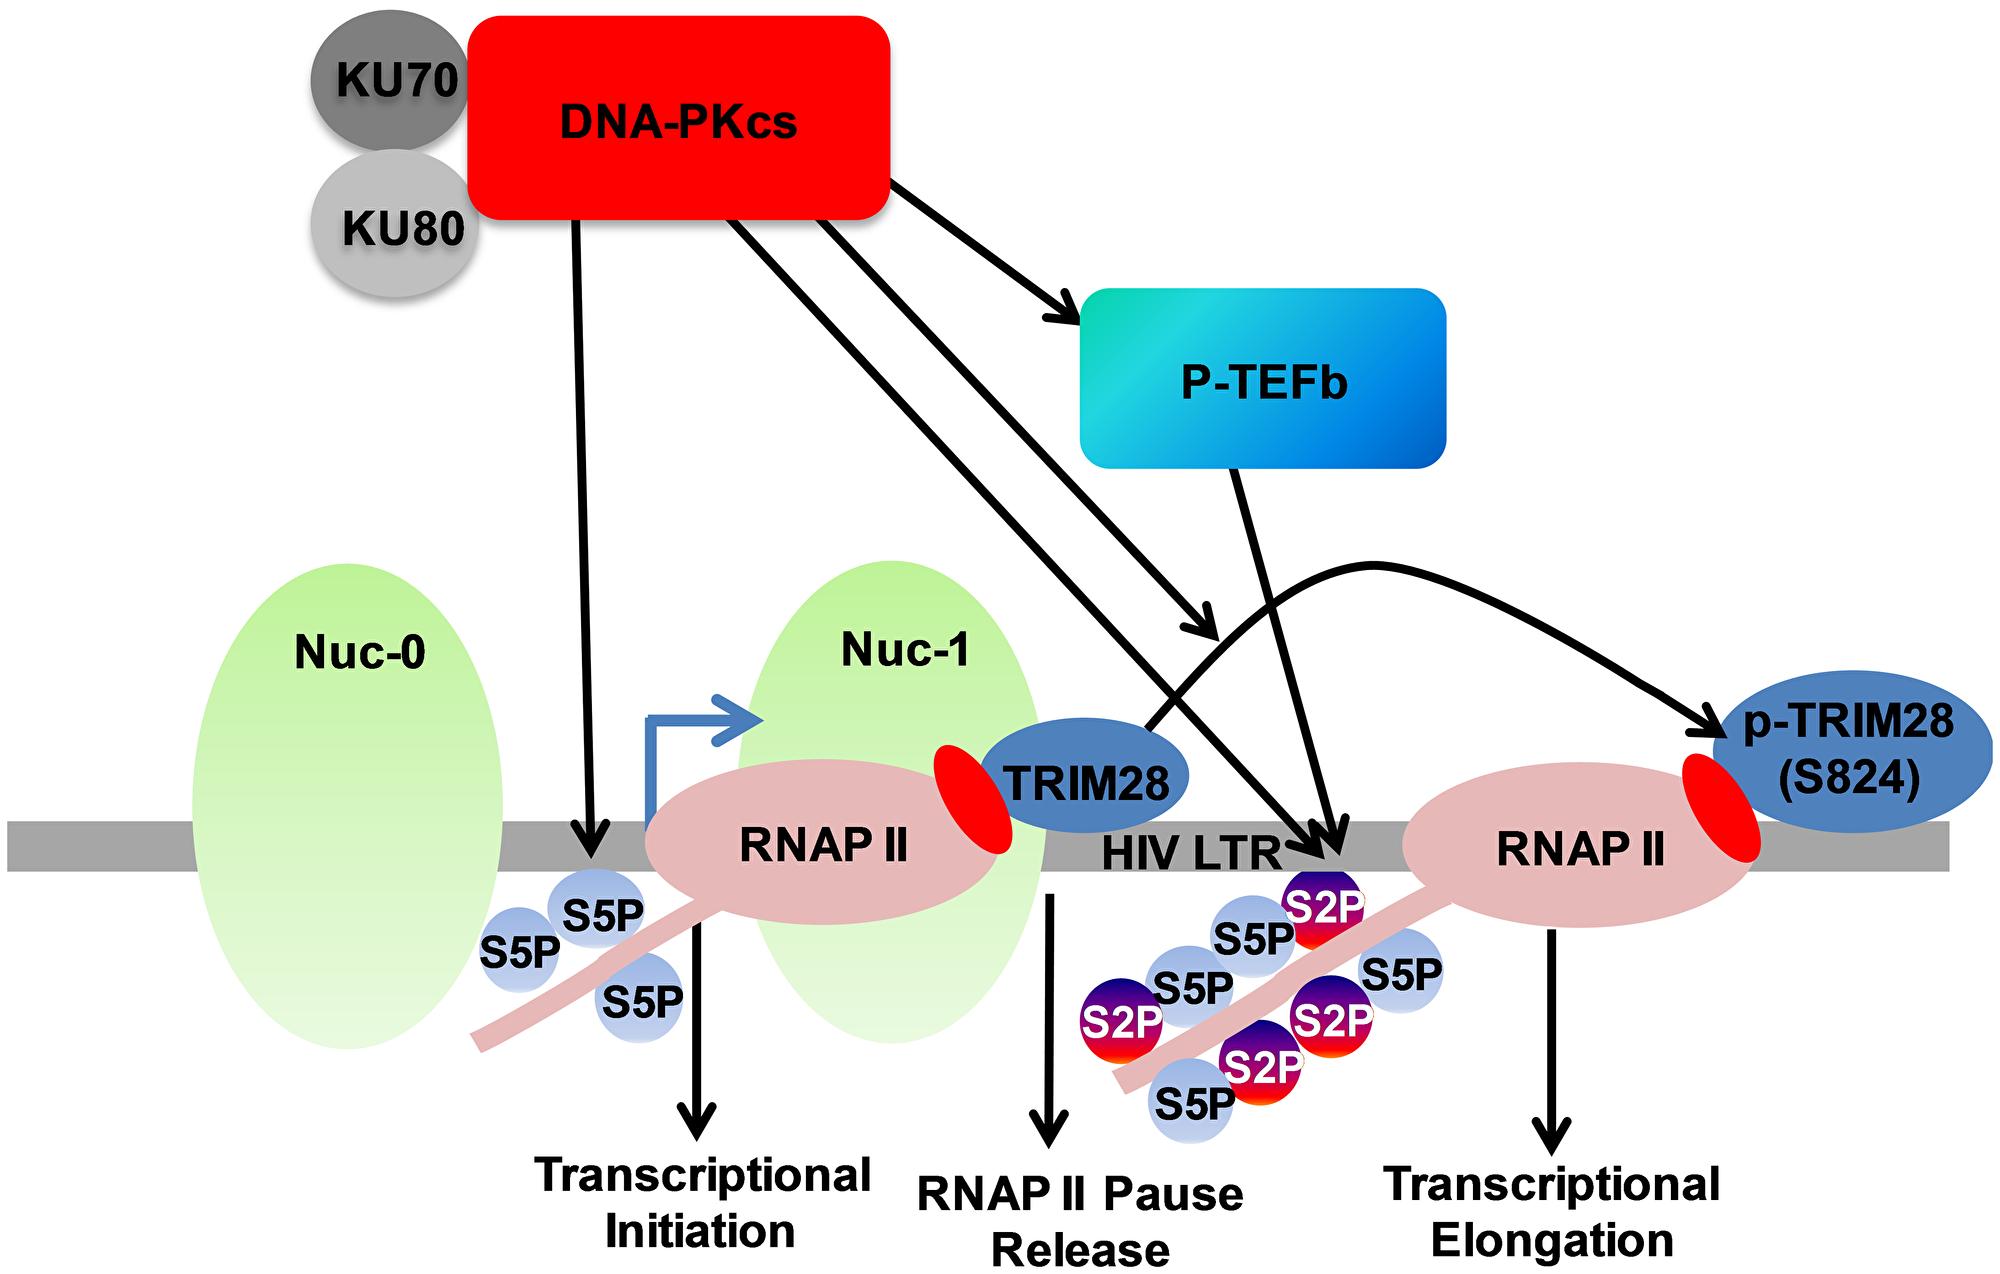 DNA-PK facilitates HIV transcription by targeting multiple mechanisms.